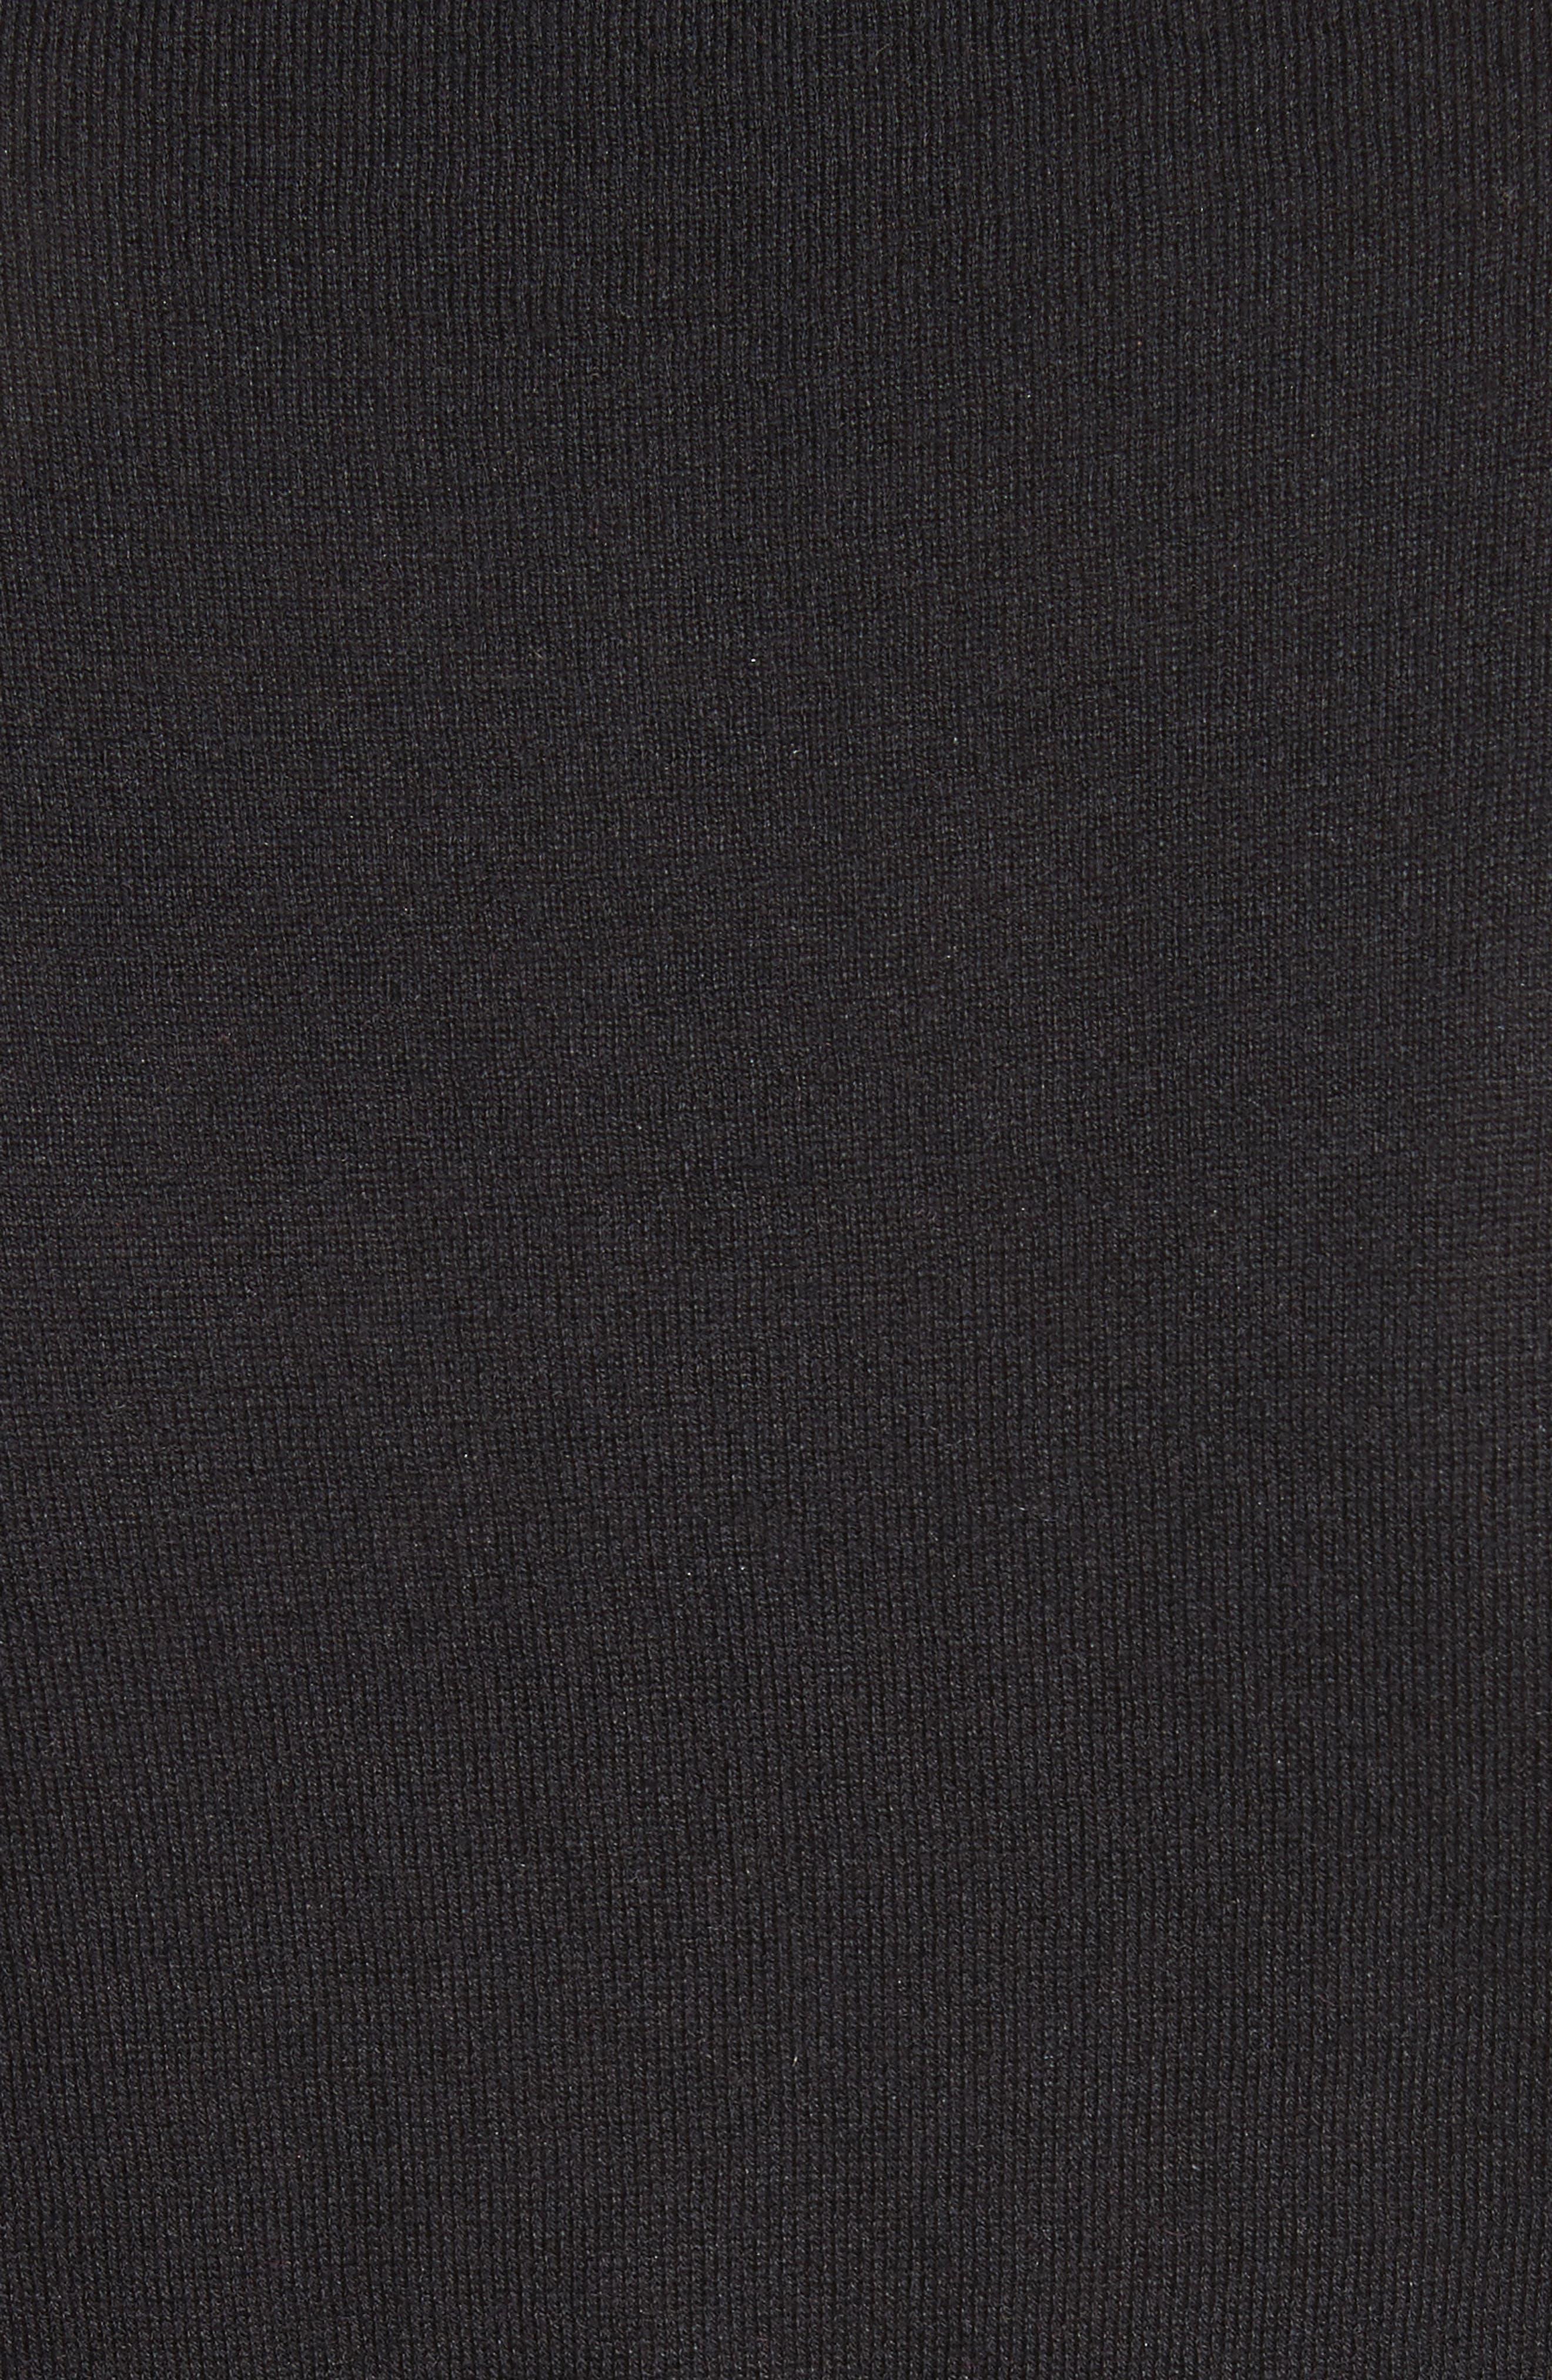 scallop silk blend cardigan,                             Alternate thumbnail 5, color,                             BLACK